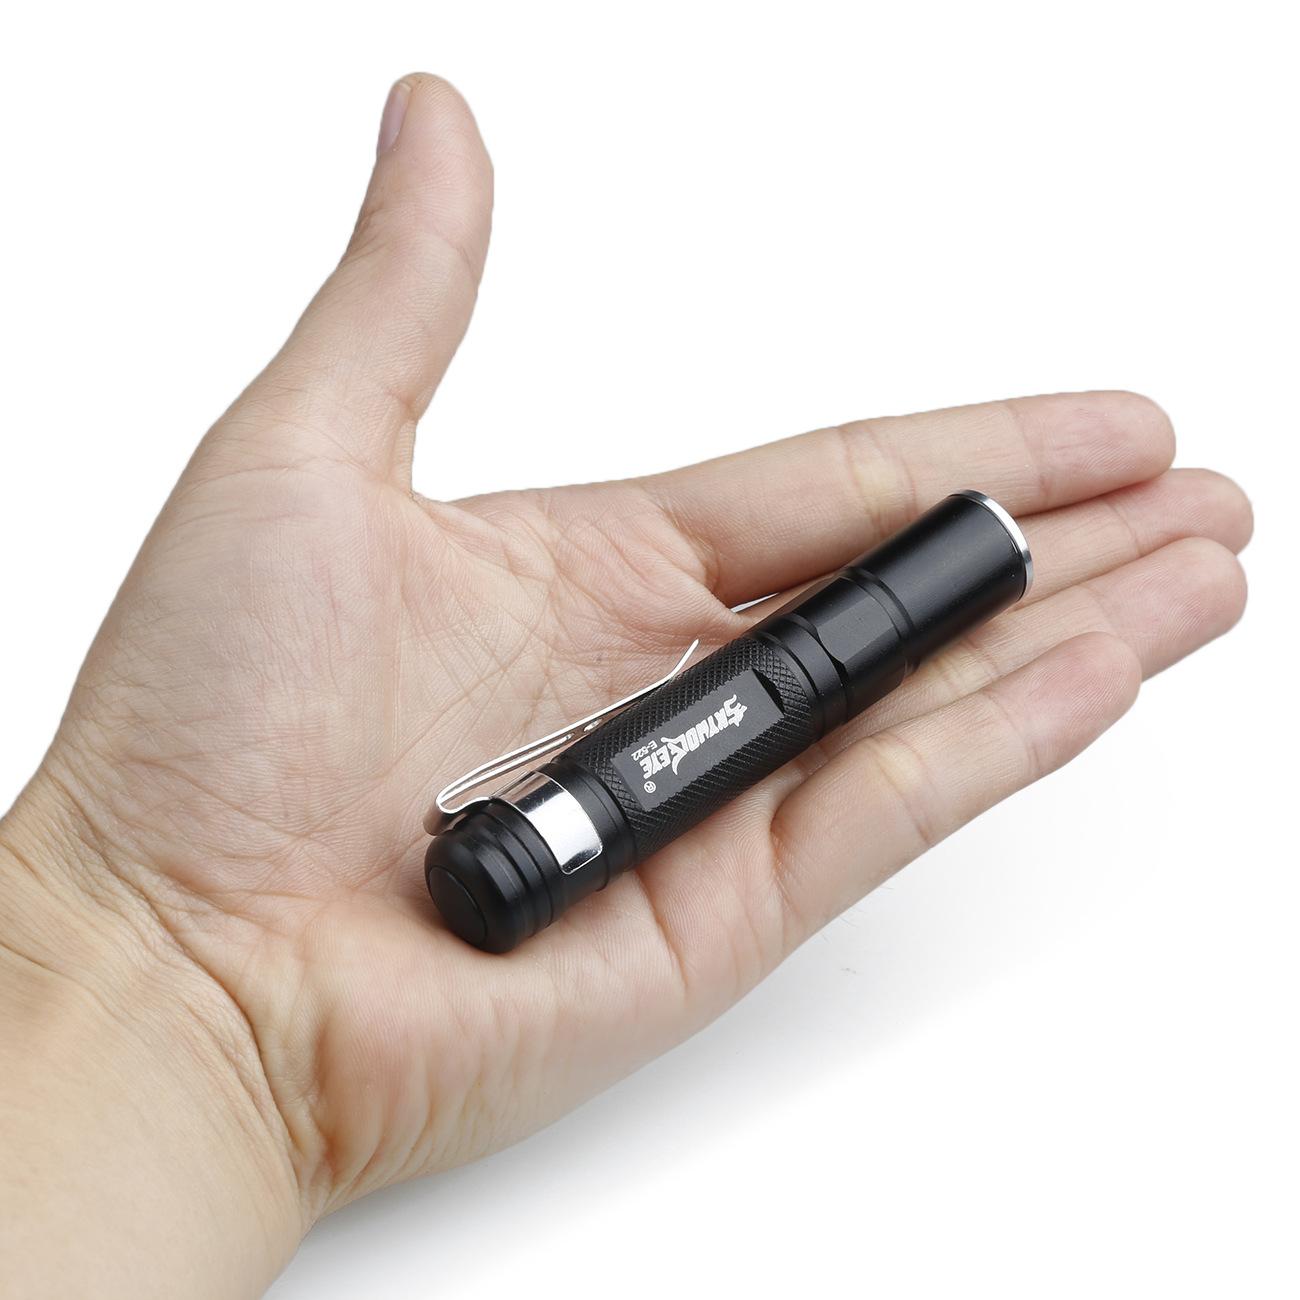 skywolfeye迷你伸缩户外LED强光铝合金手电筒 批发笔夹便携小家电